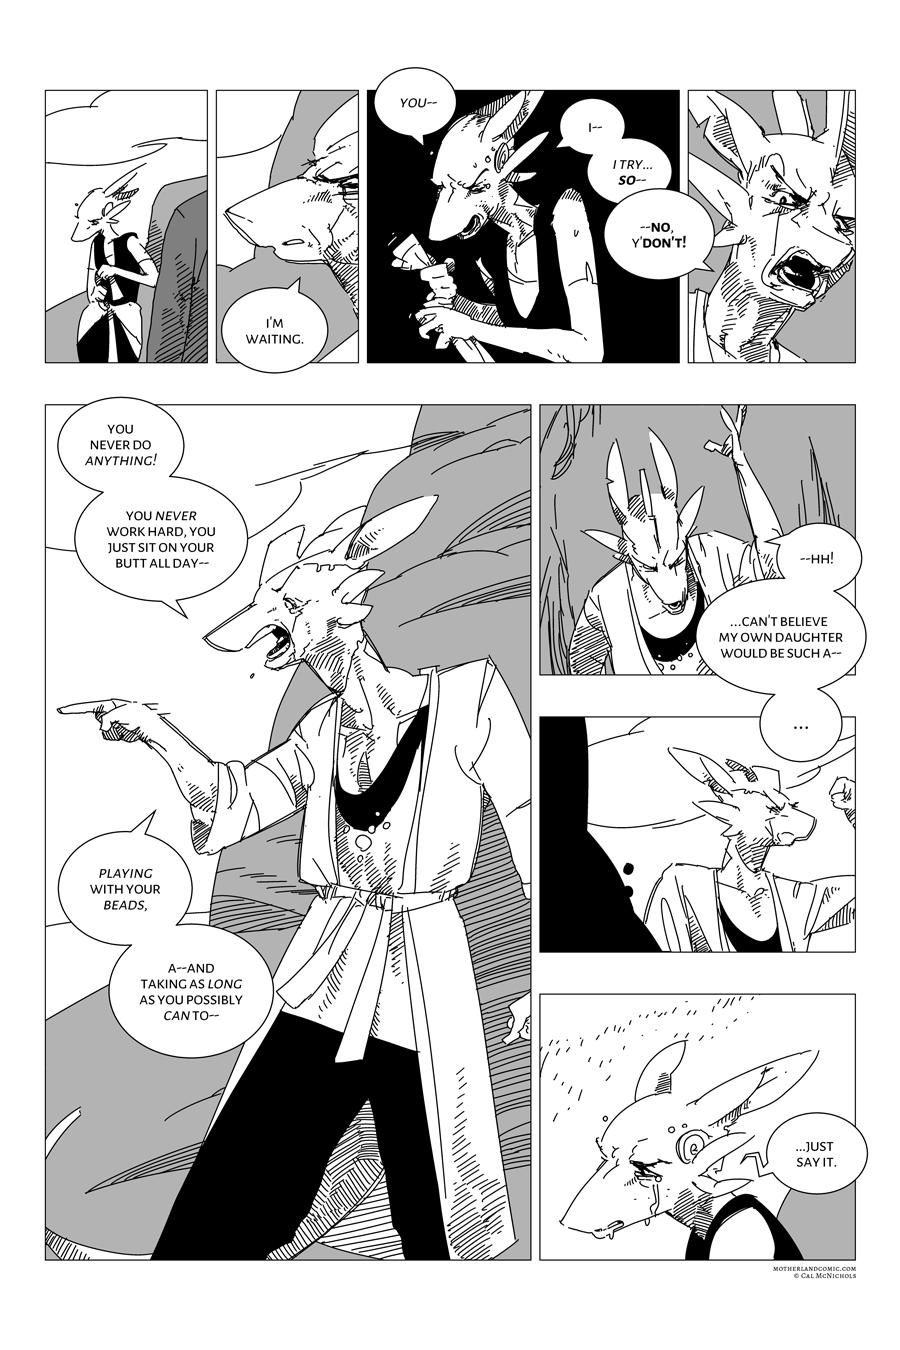 pg 74